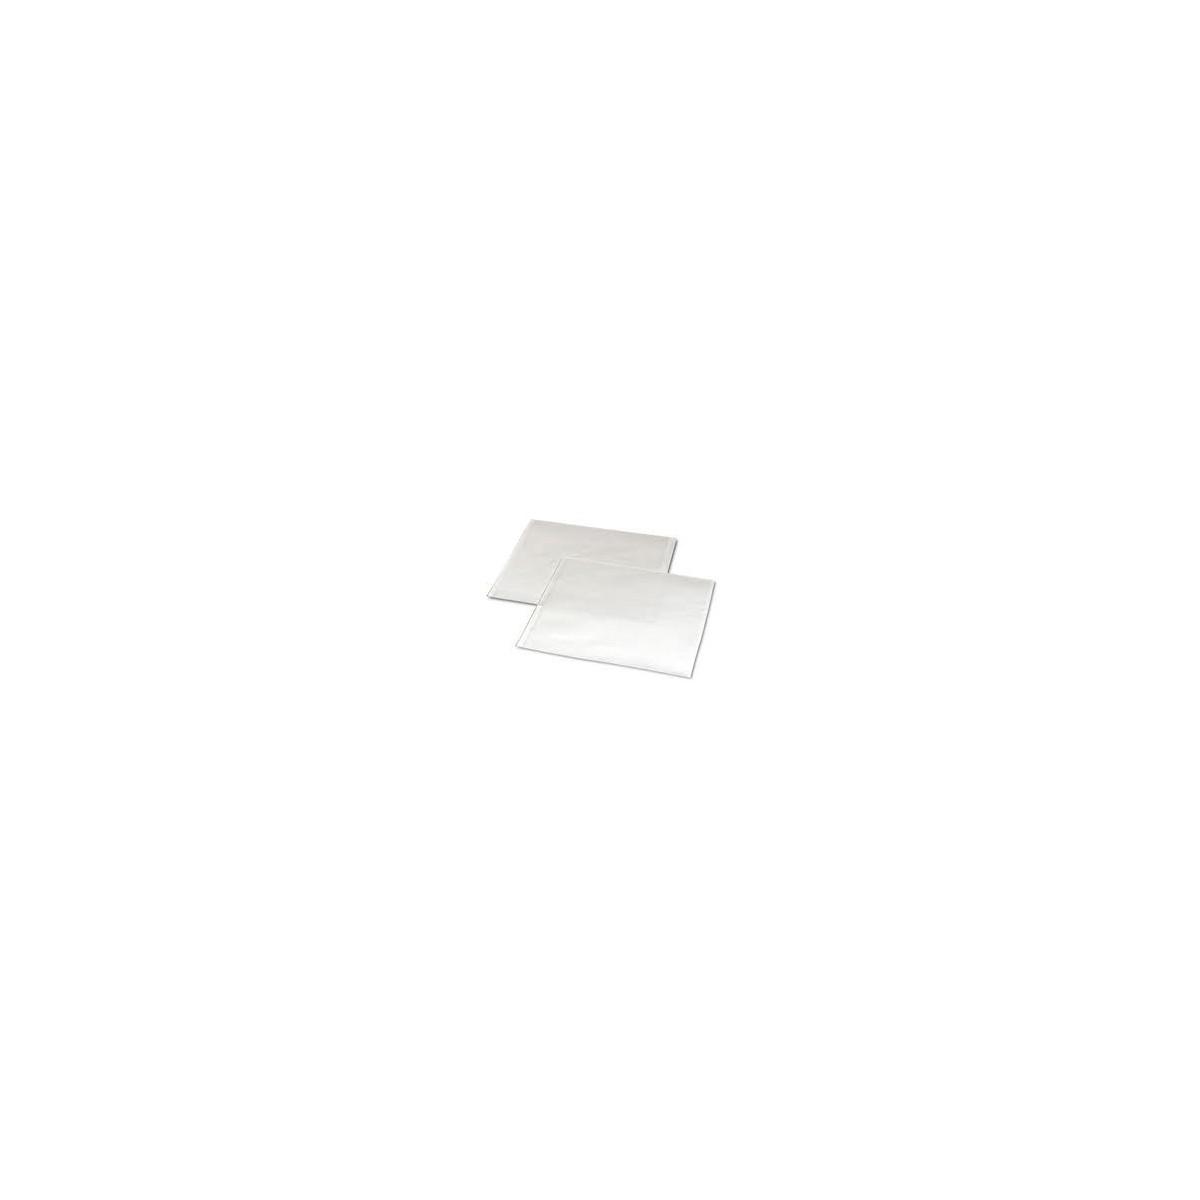 25 Fogli Cm.100x130 in Polipropilene Trasparente Piegati 1x1